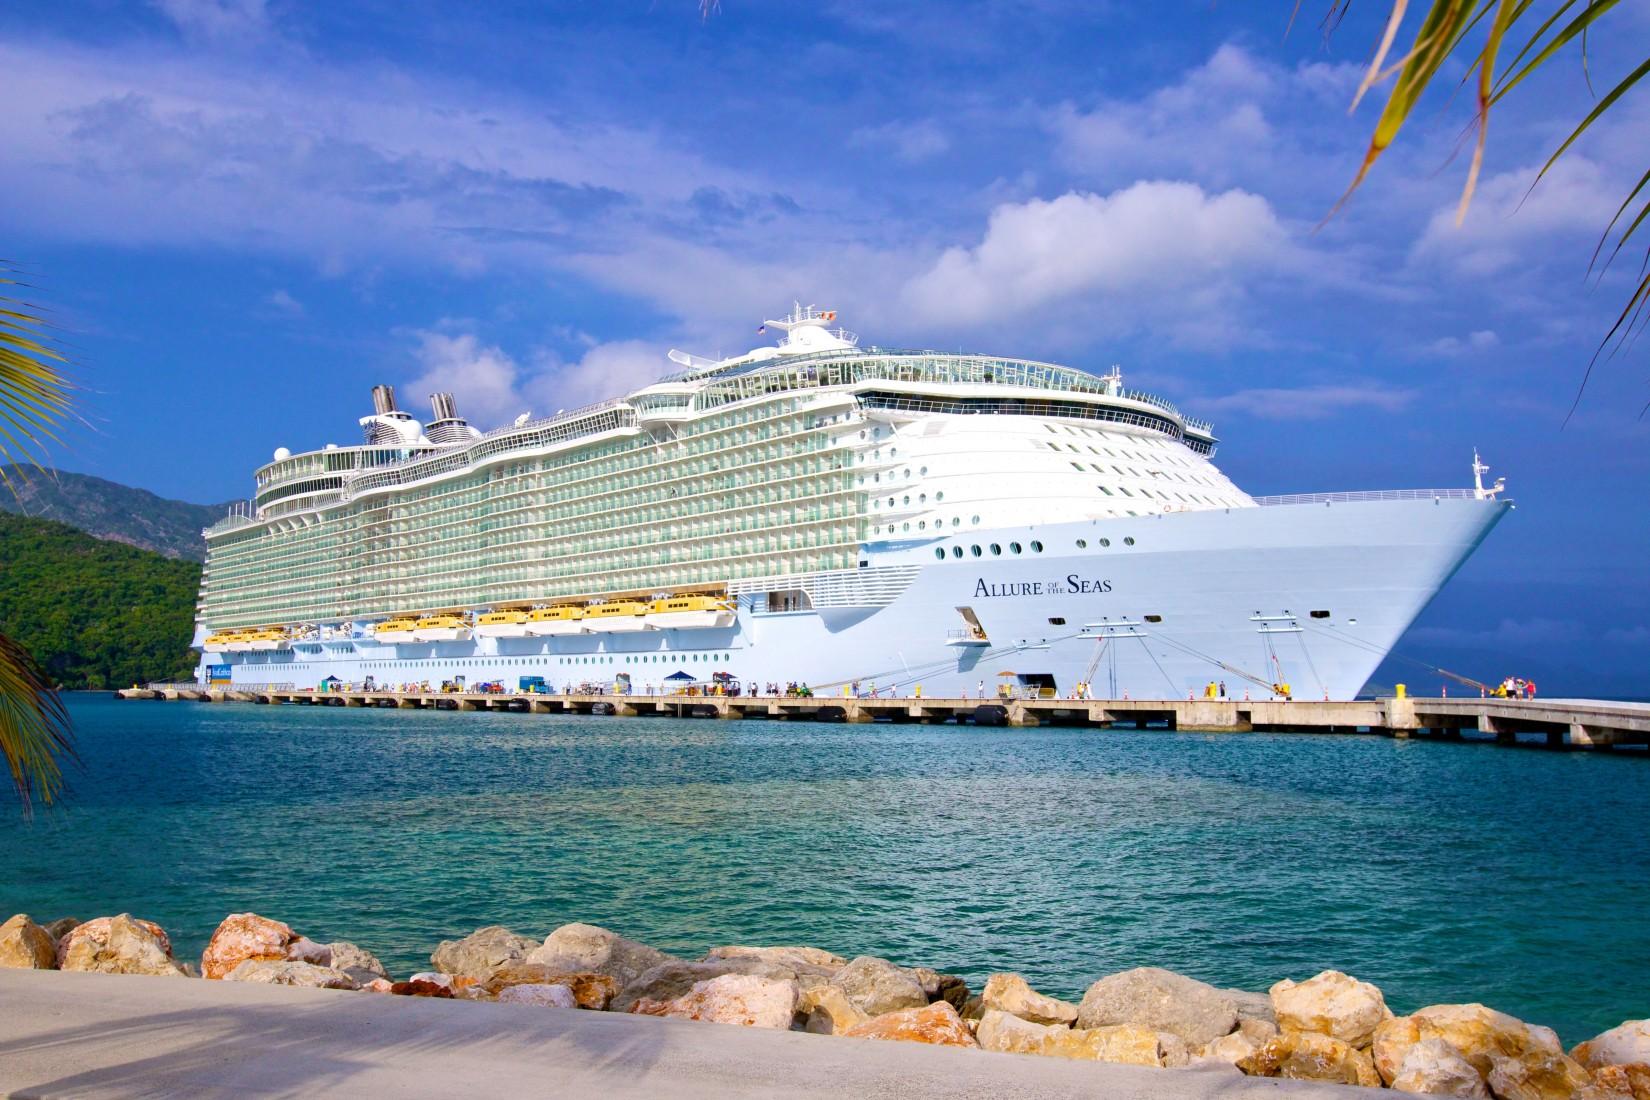 Royal Caribbean In 2015 New Ships New Itineraries New Food Royal Caribbean Connect